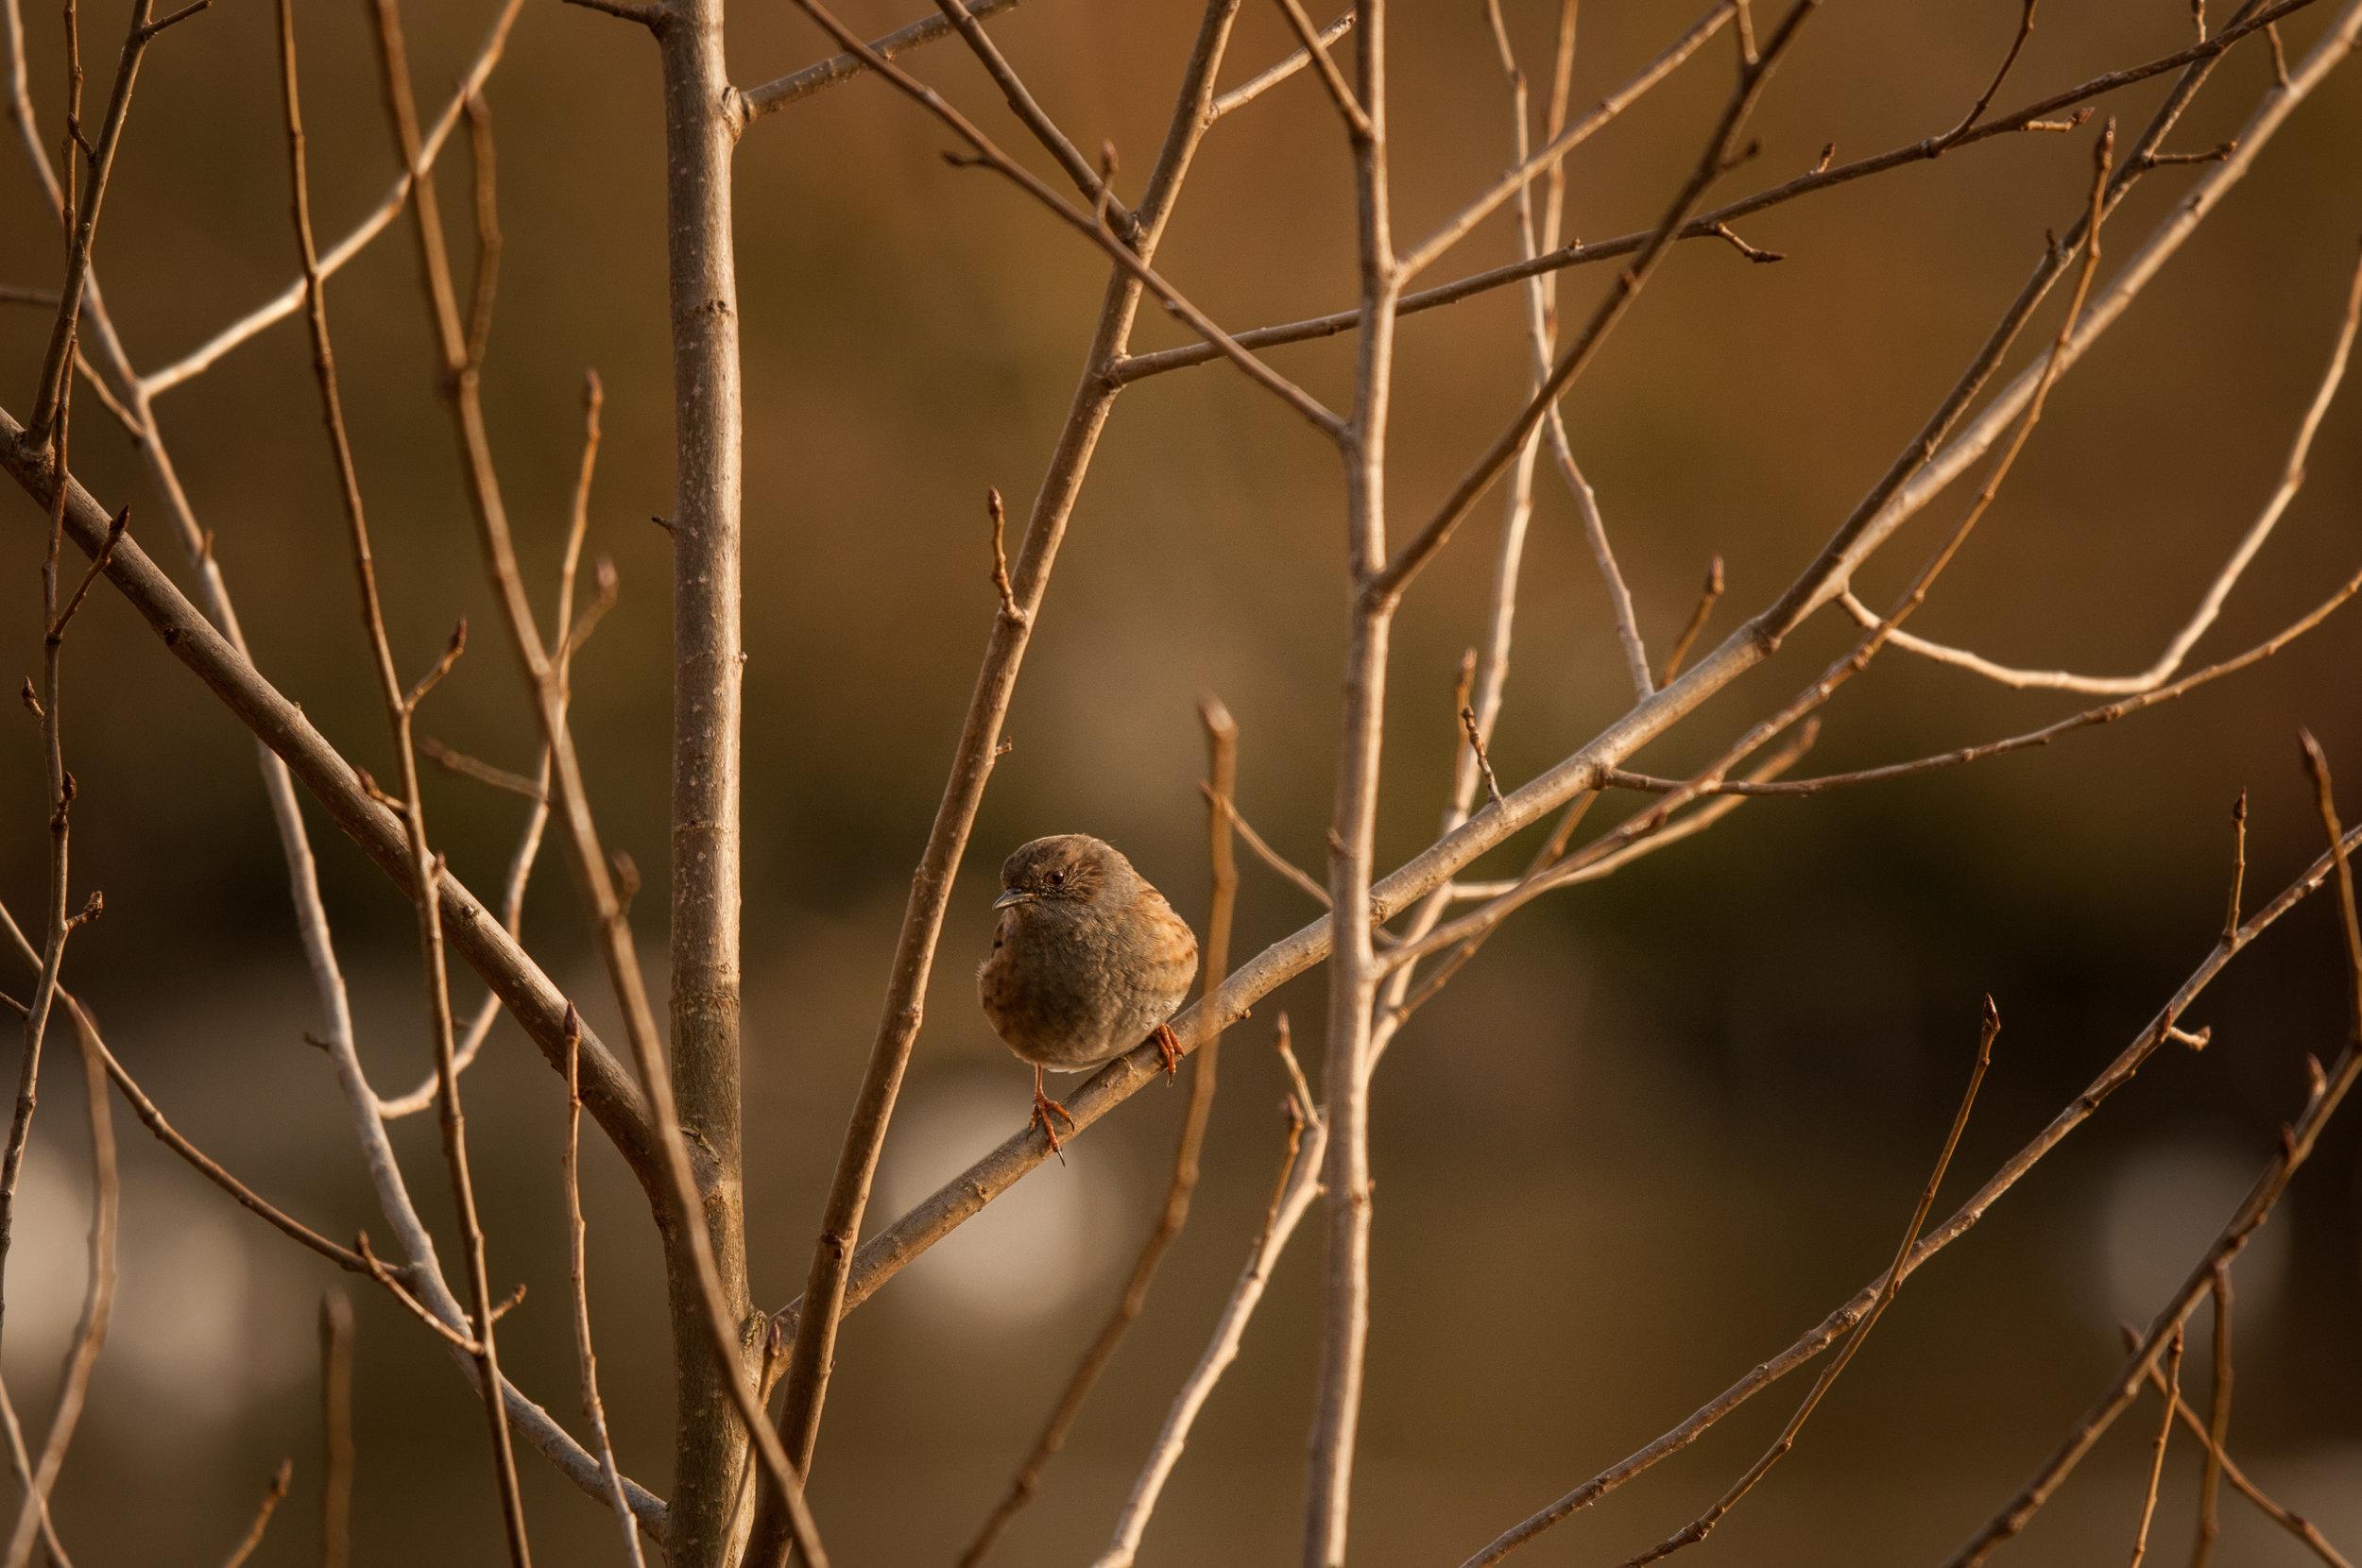 Ptaki Lochend - 2019 - MAR_4529.jpg